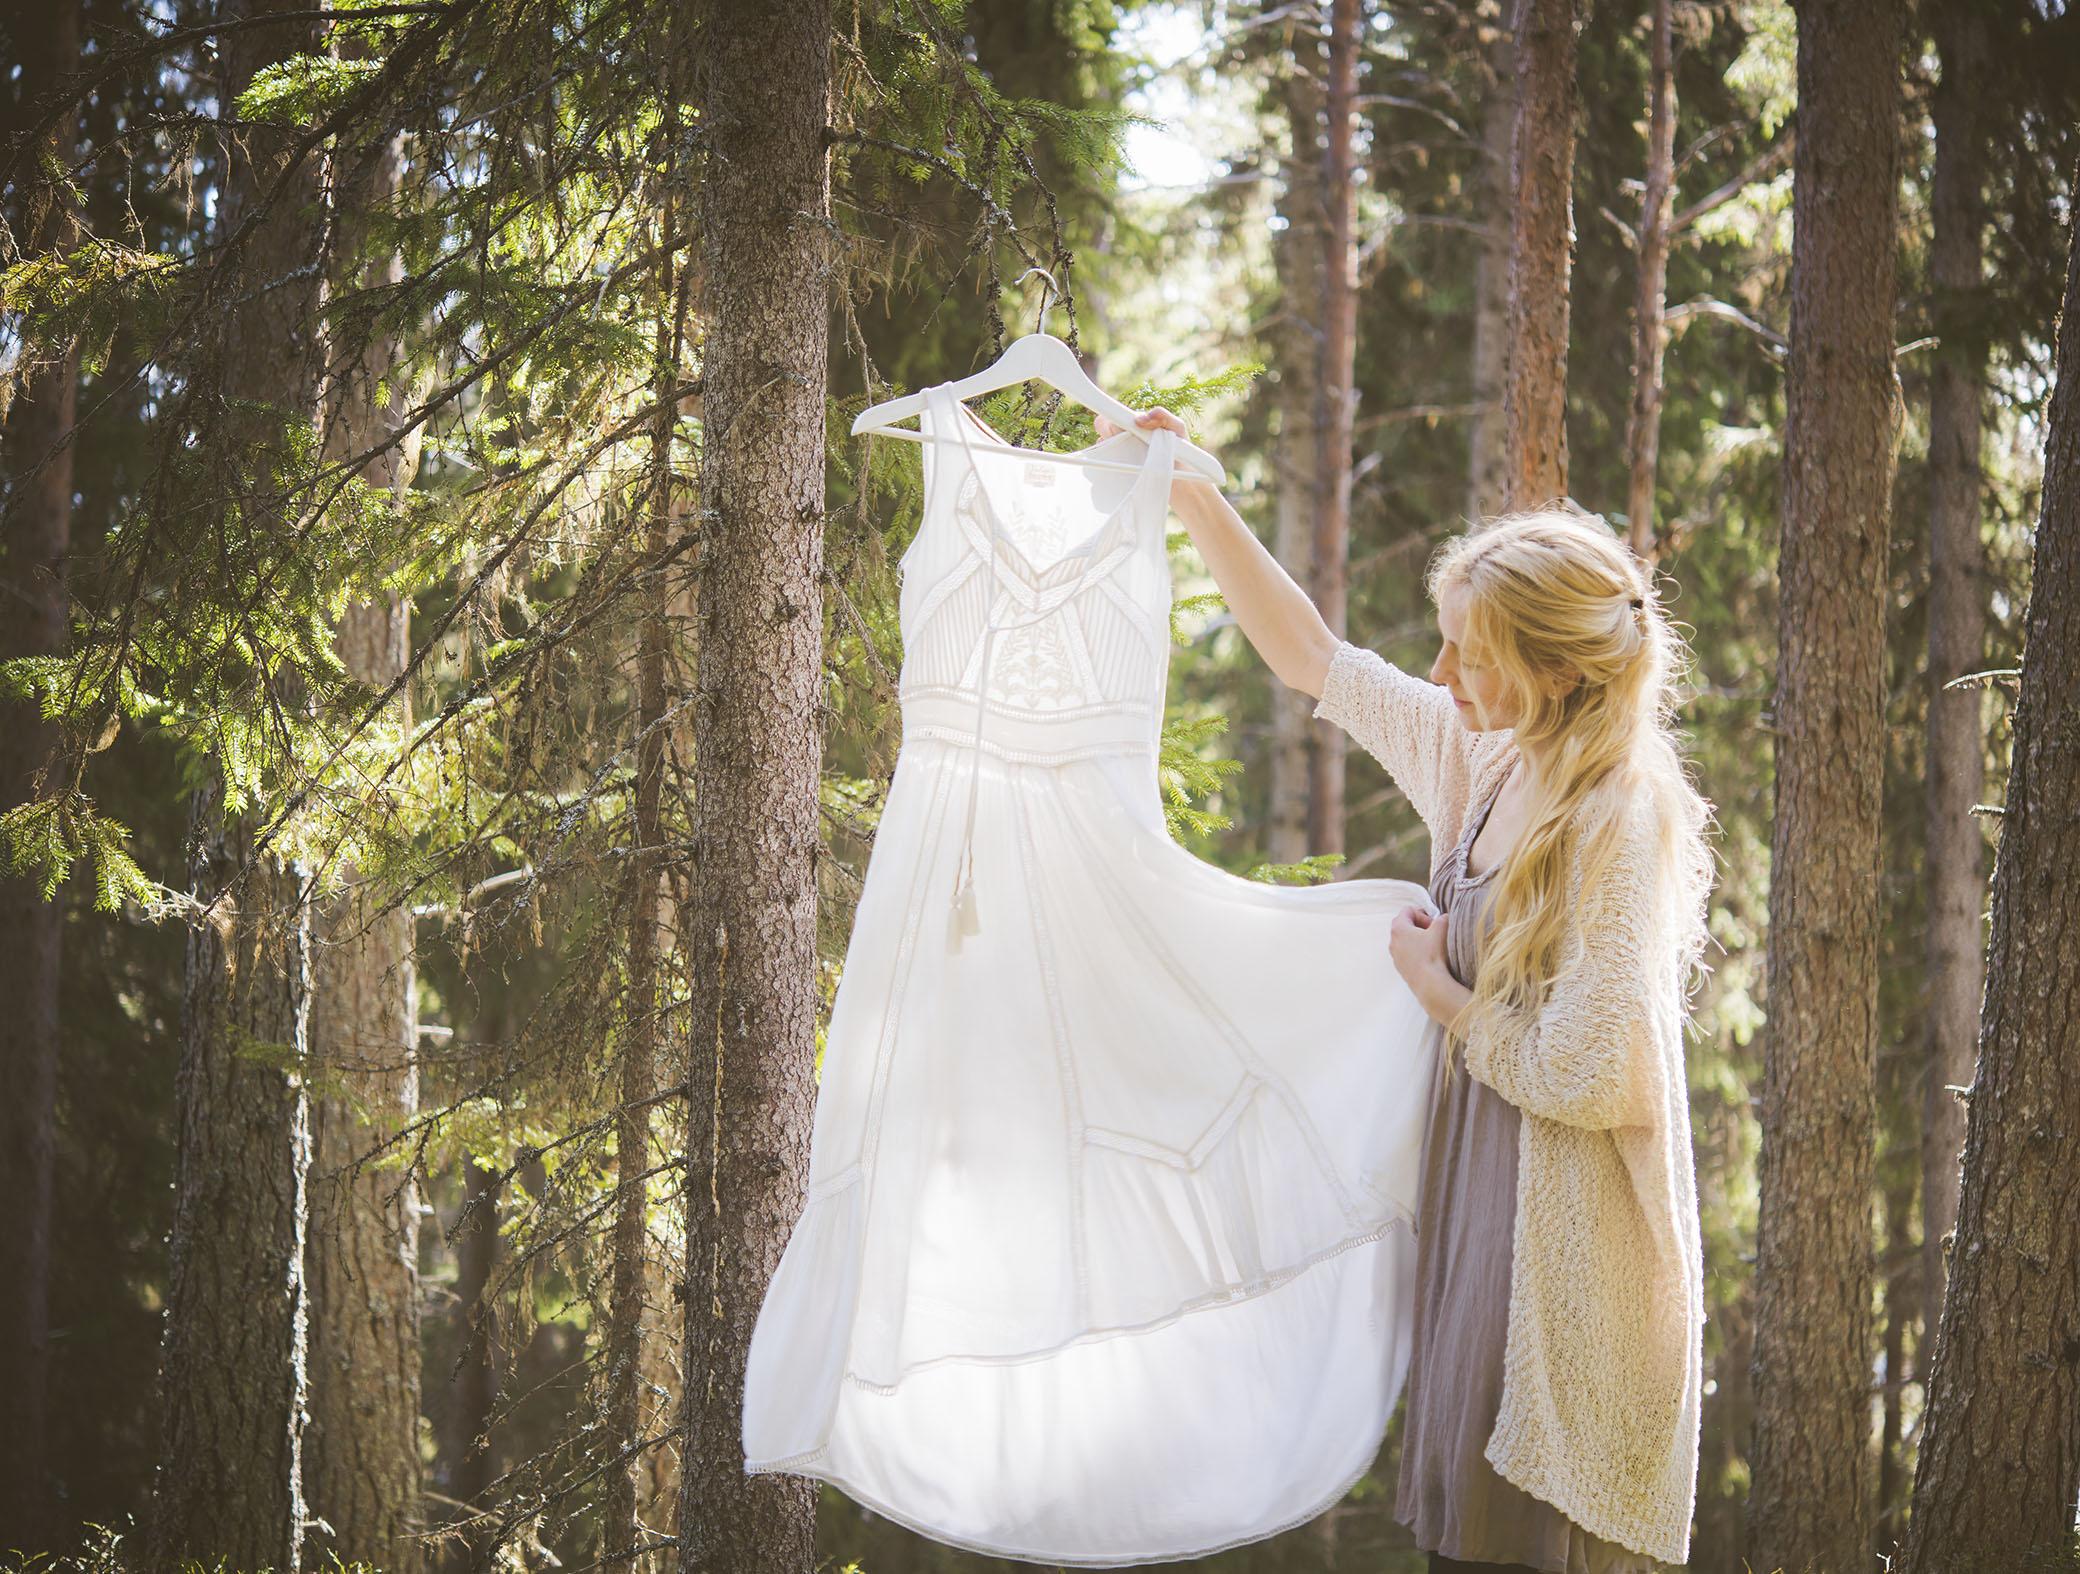 outfit | Jonna Jinton